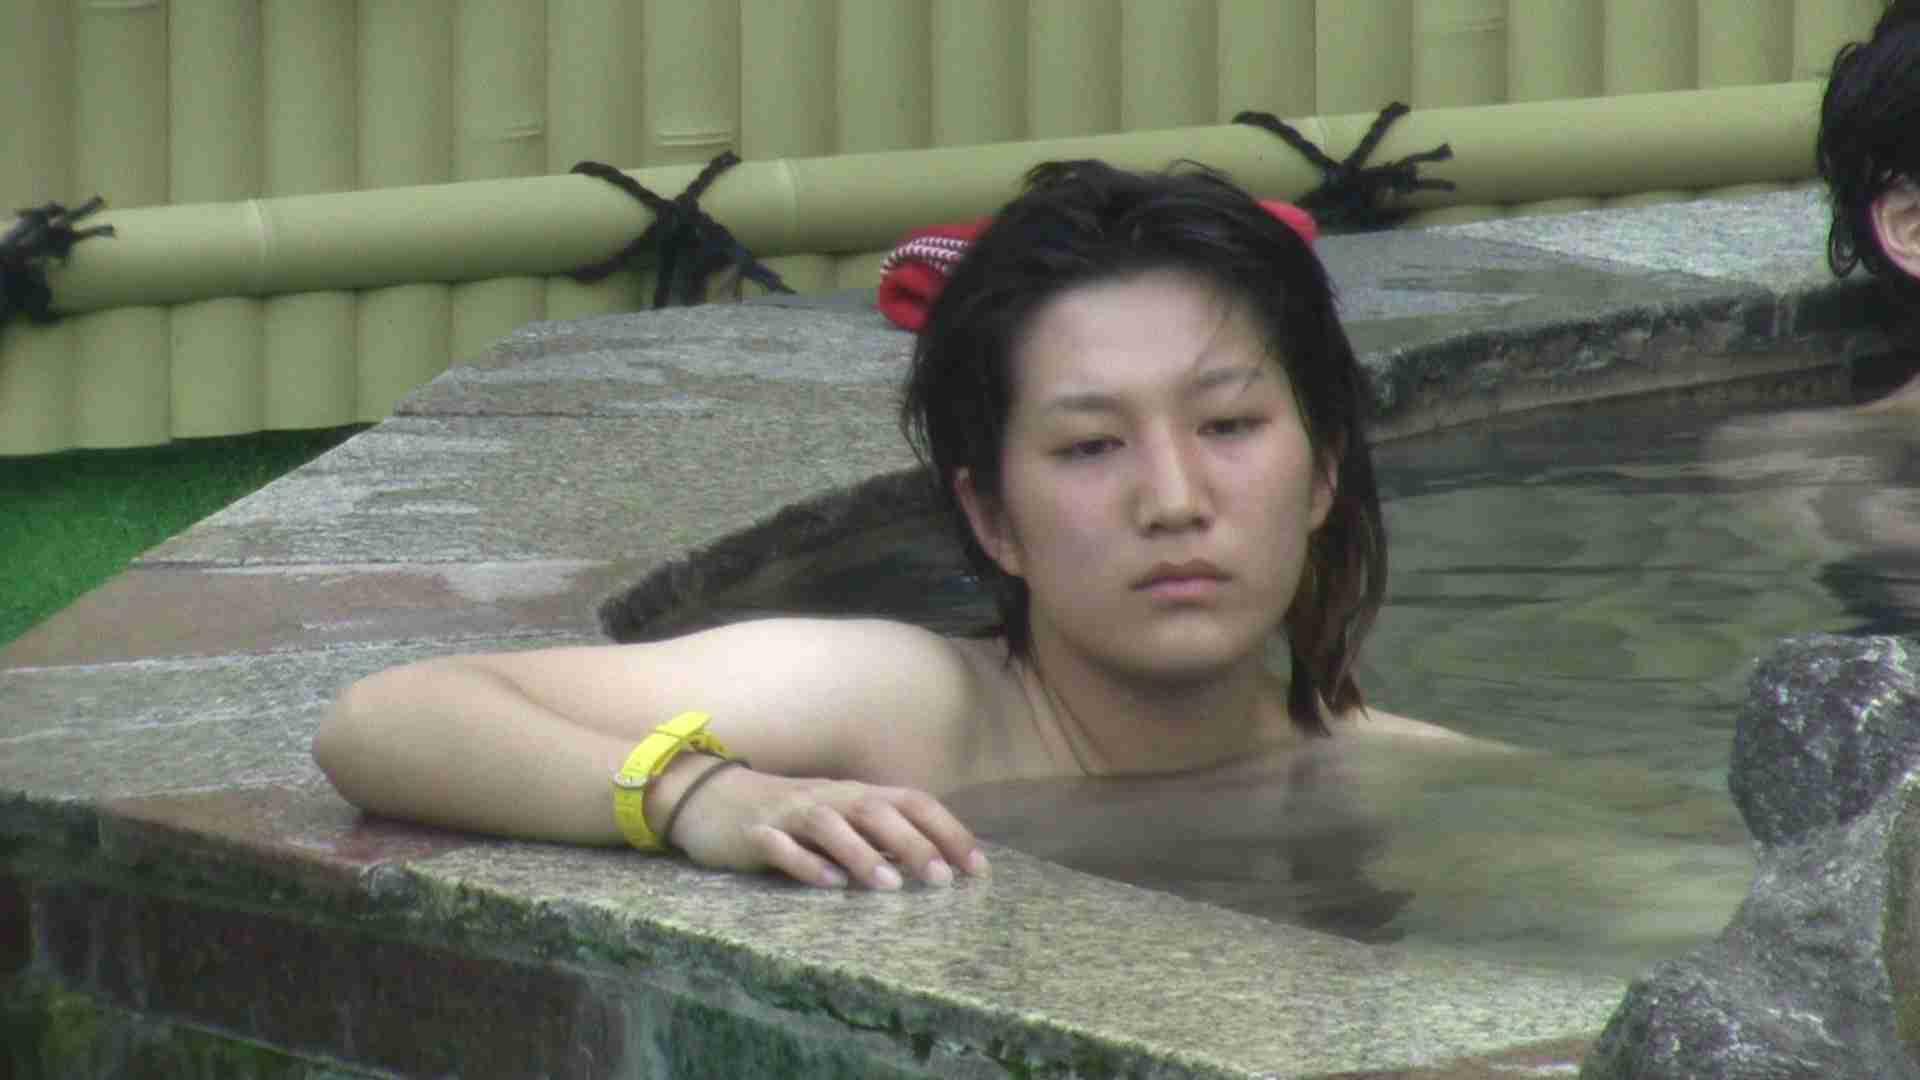 Aquaな露天風呂Vol.132 0  61連発 16